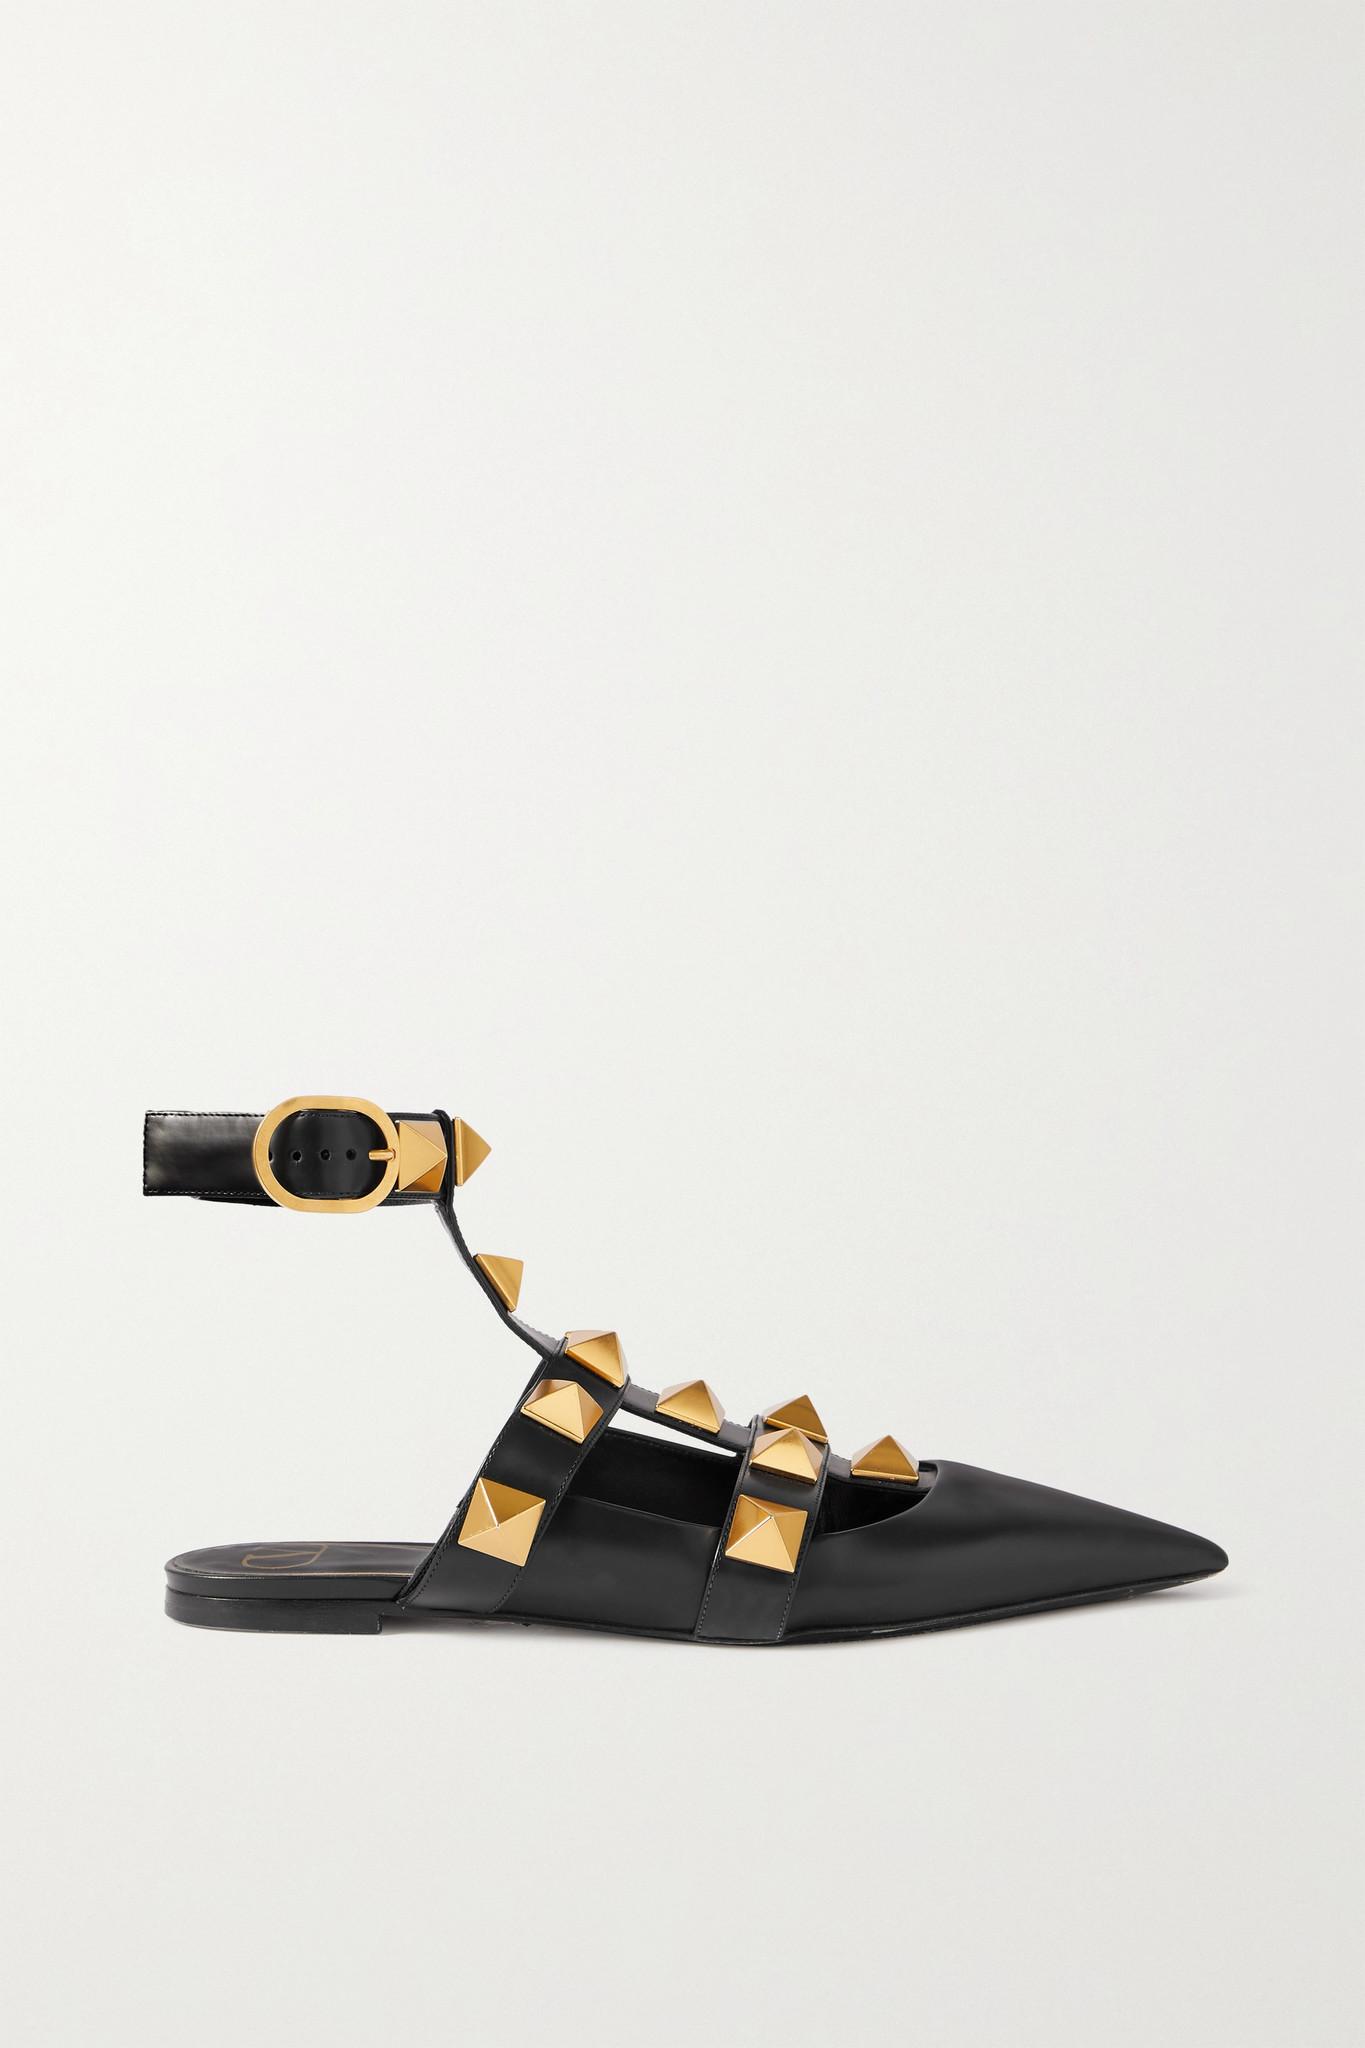 VALENTINO - Valentino Garavani Roman Stud Leather Point-toe Flats - Black - IT39.5